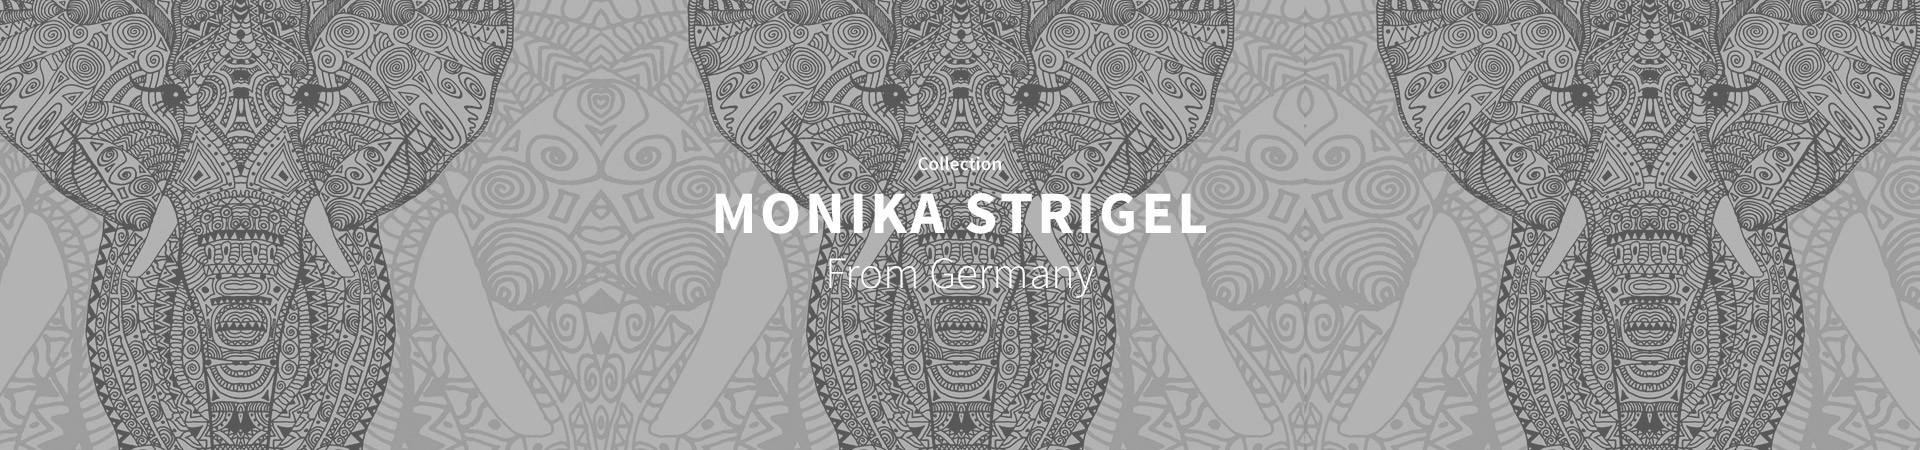 Monika Strigel